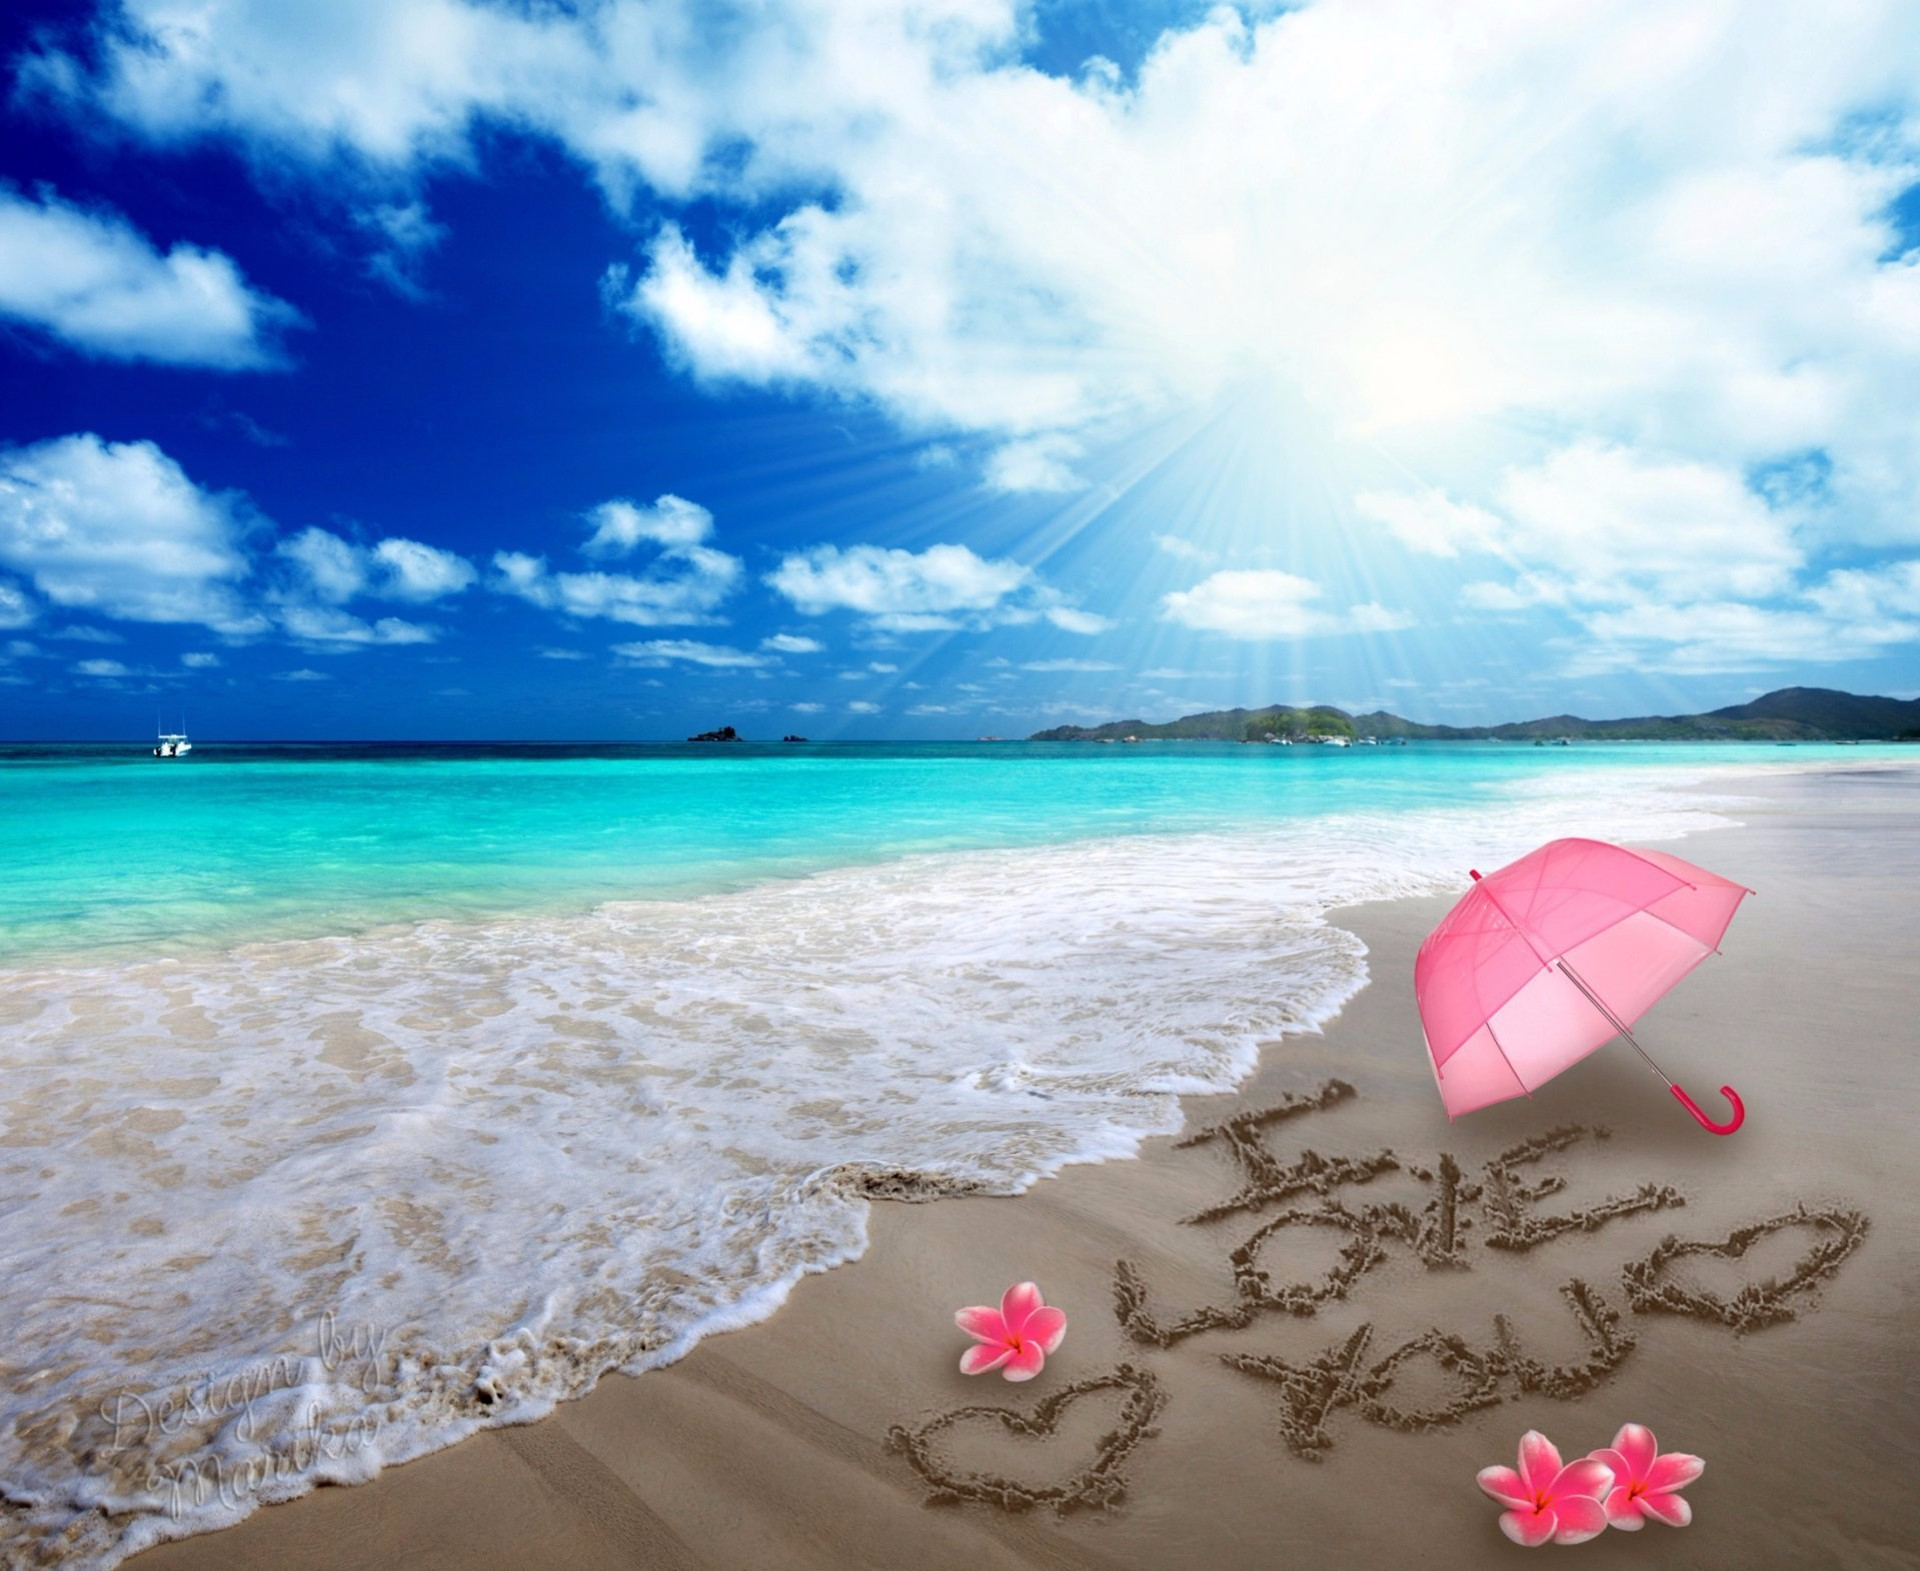 playa-romatica-frase-iloveyou